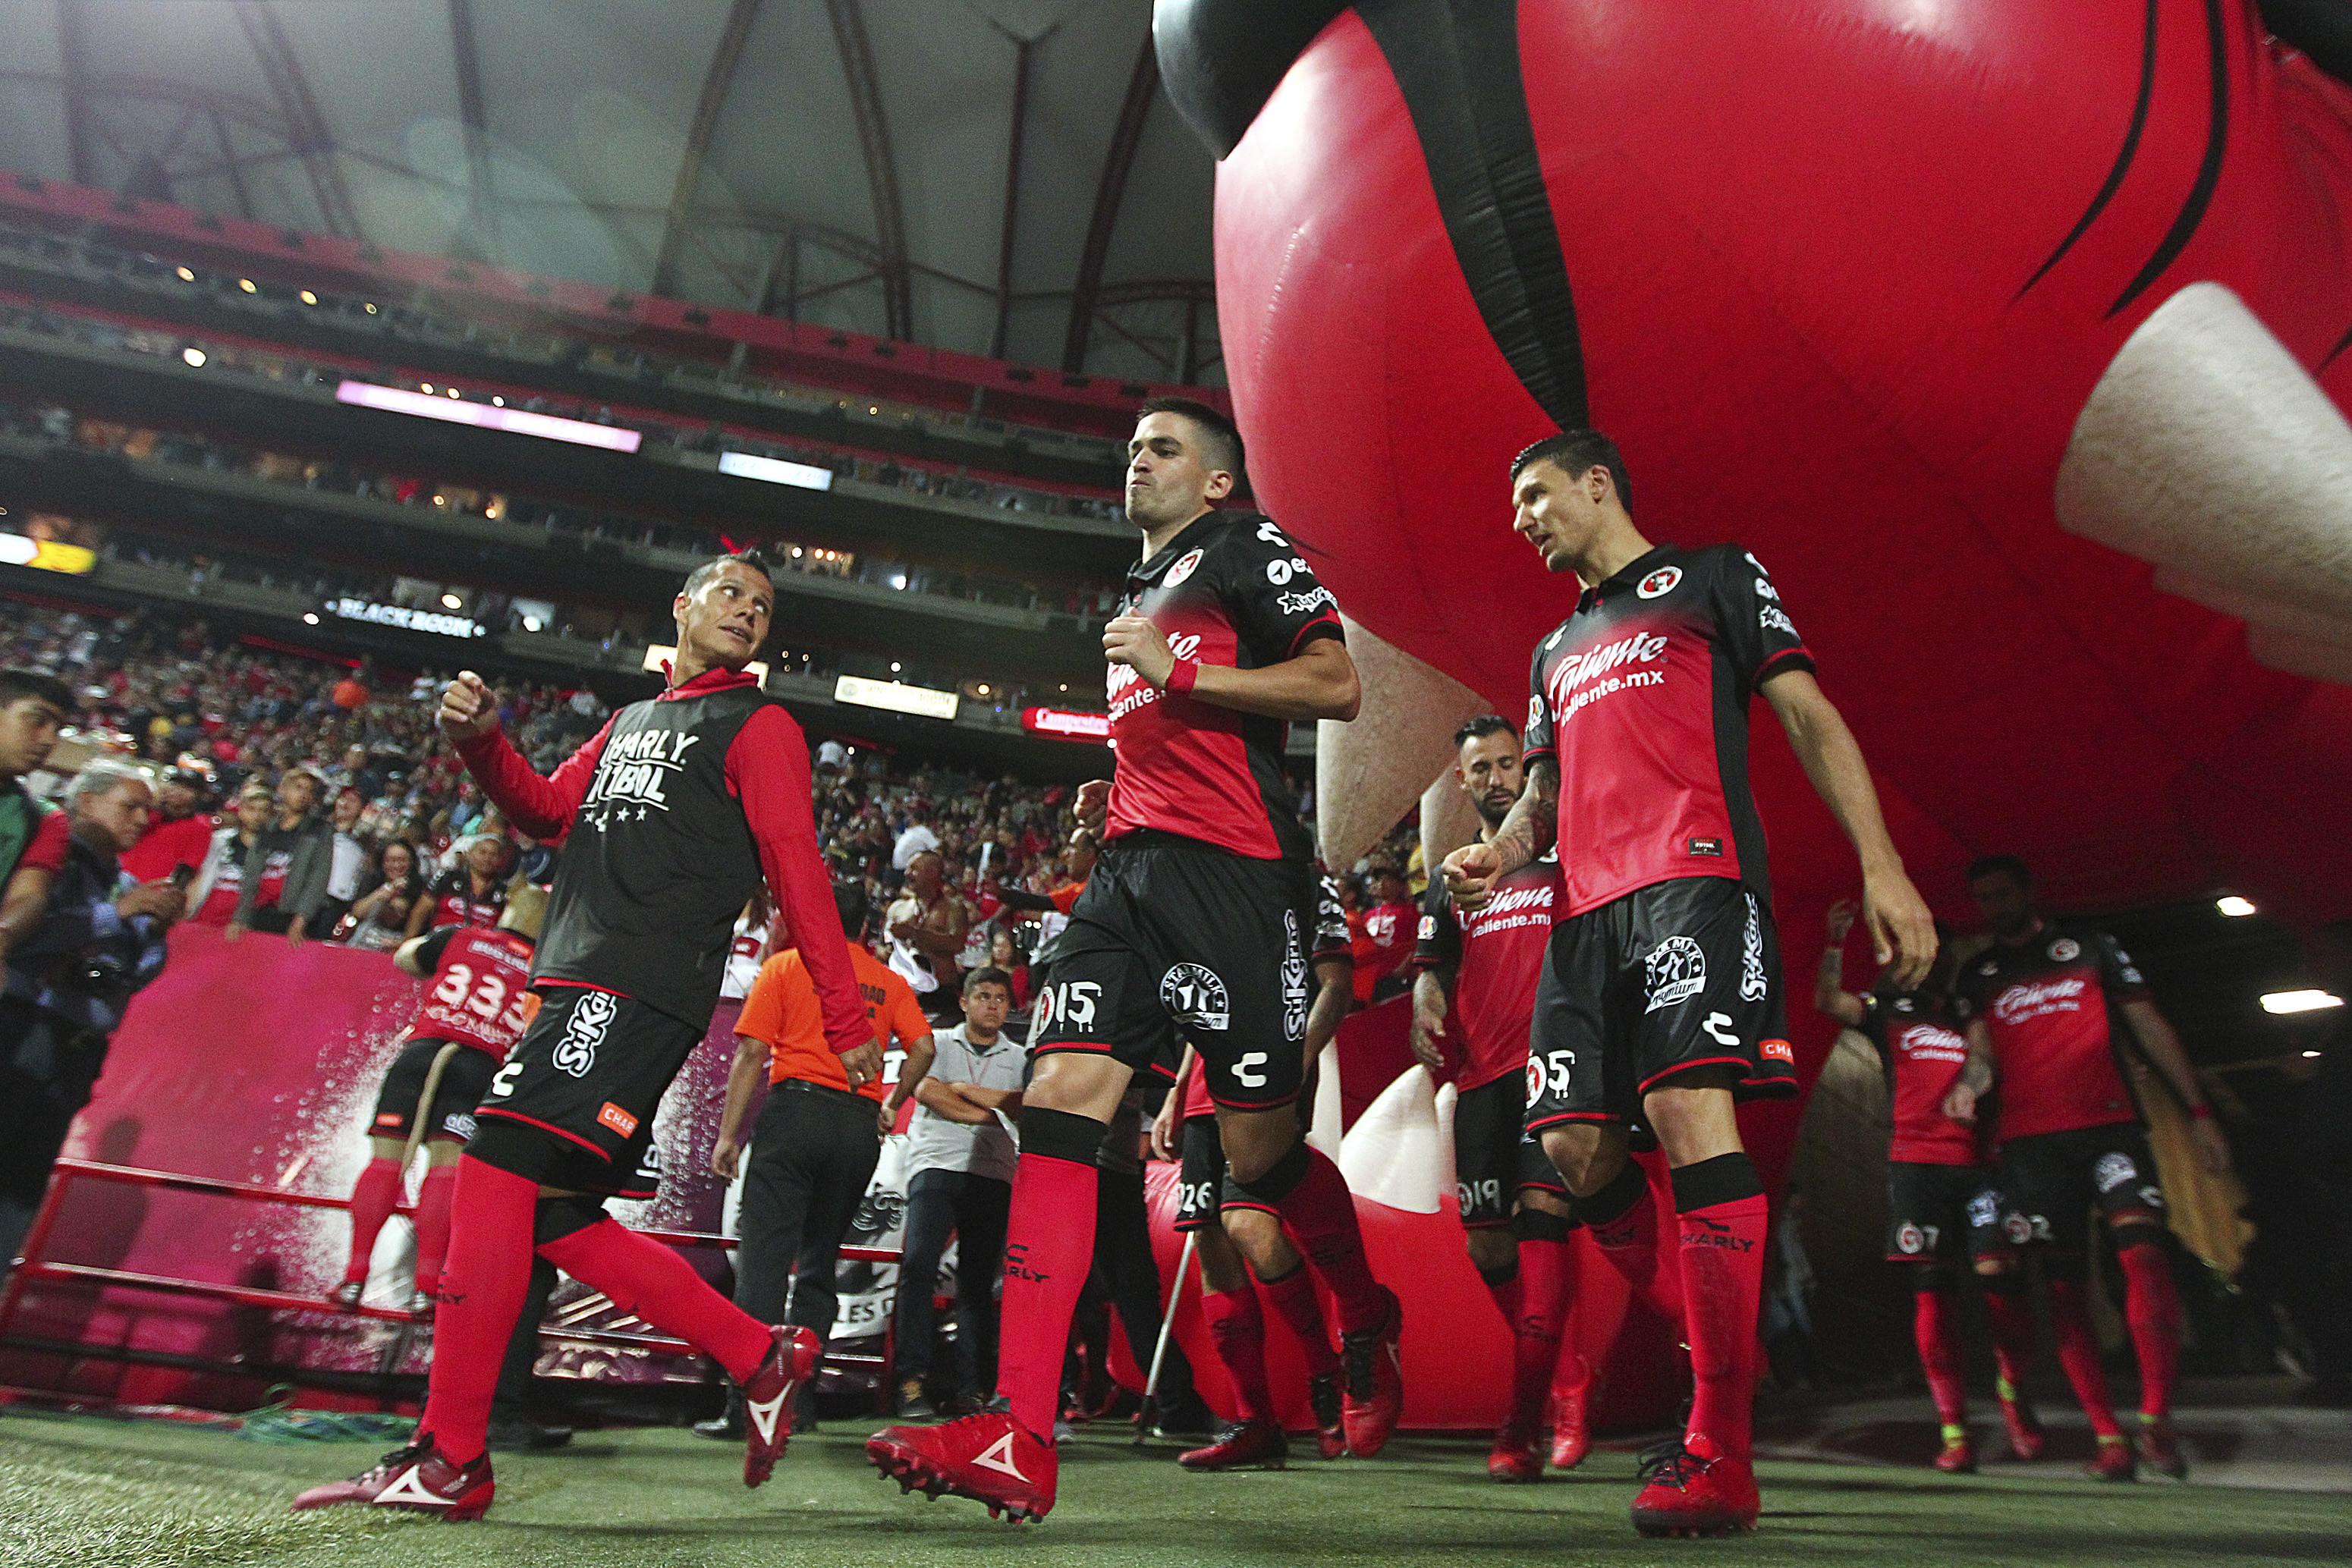 Xolos de Tijuana, Falta de Pagos, No Jugar, Jornada 16, Clausura 2018, Liga MX, Analiza, Toluca, Adeudos, Directiva